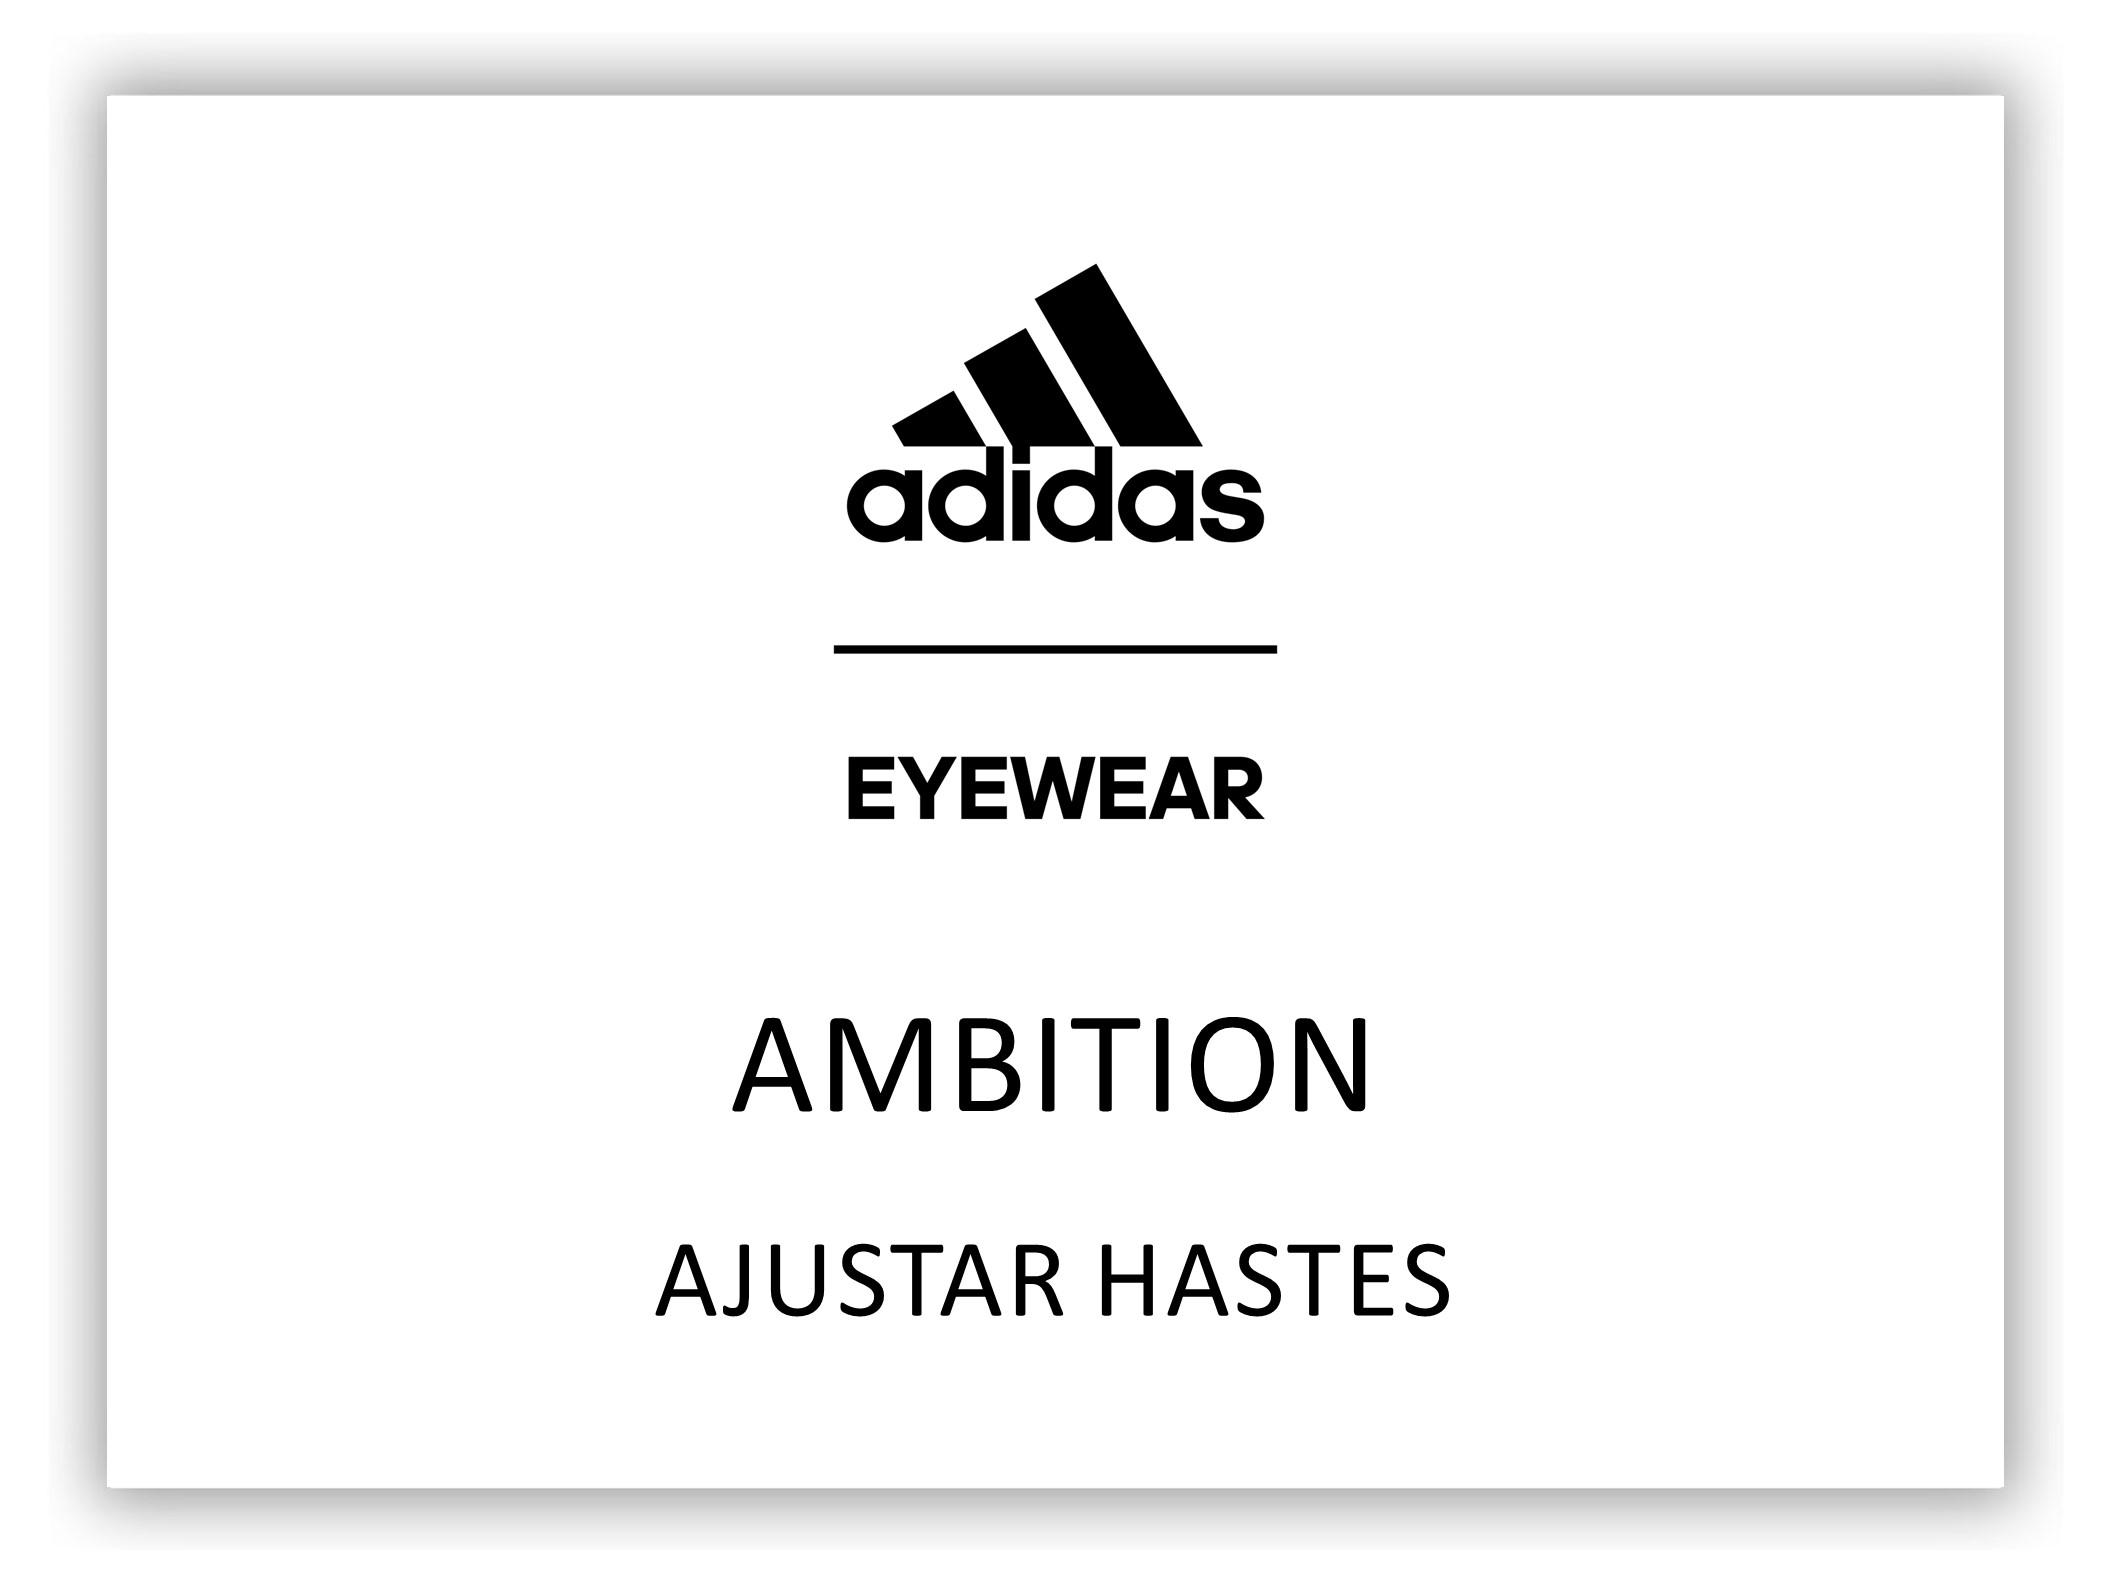 Adidas_capa-AMBITION-HASTES